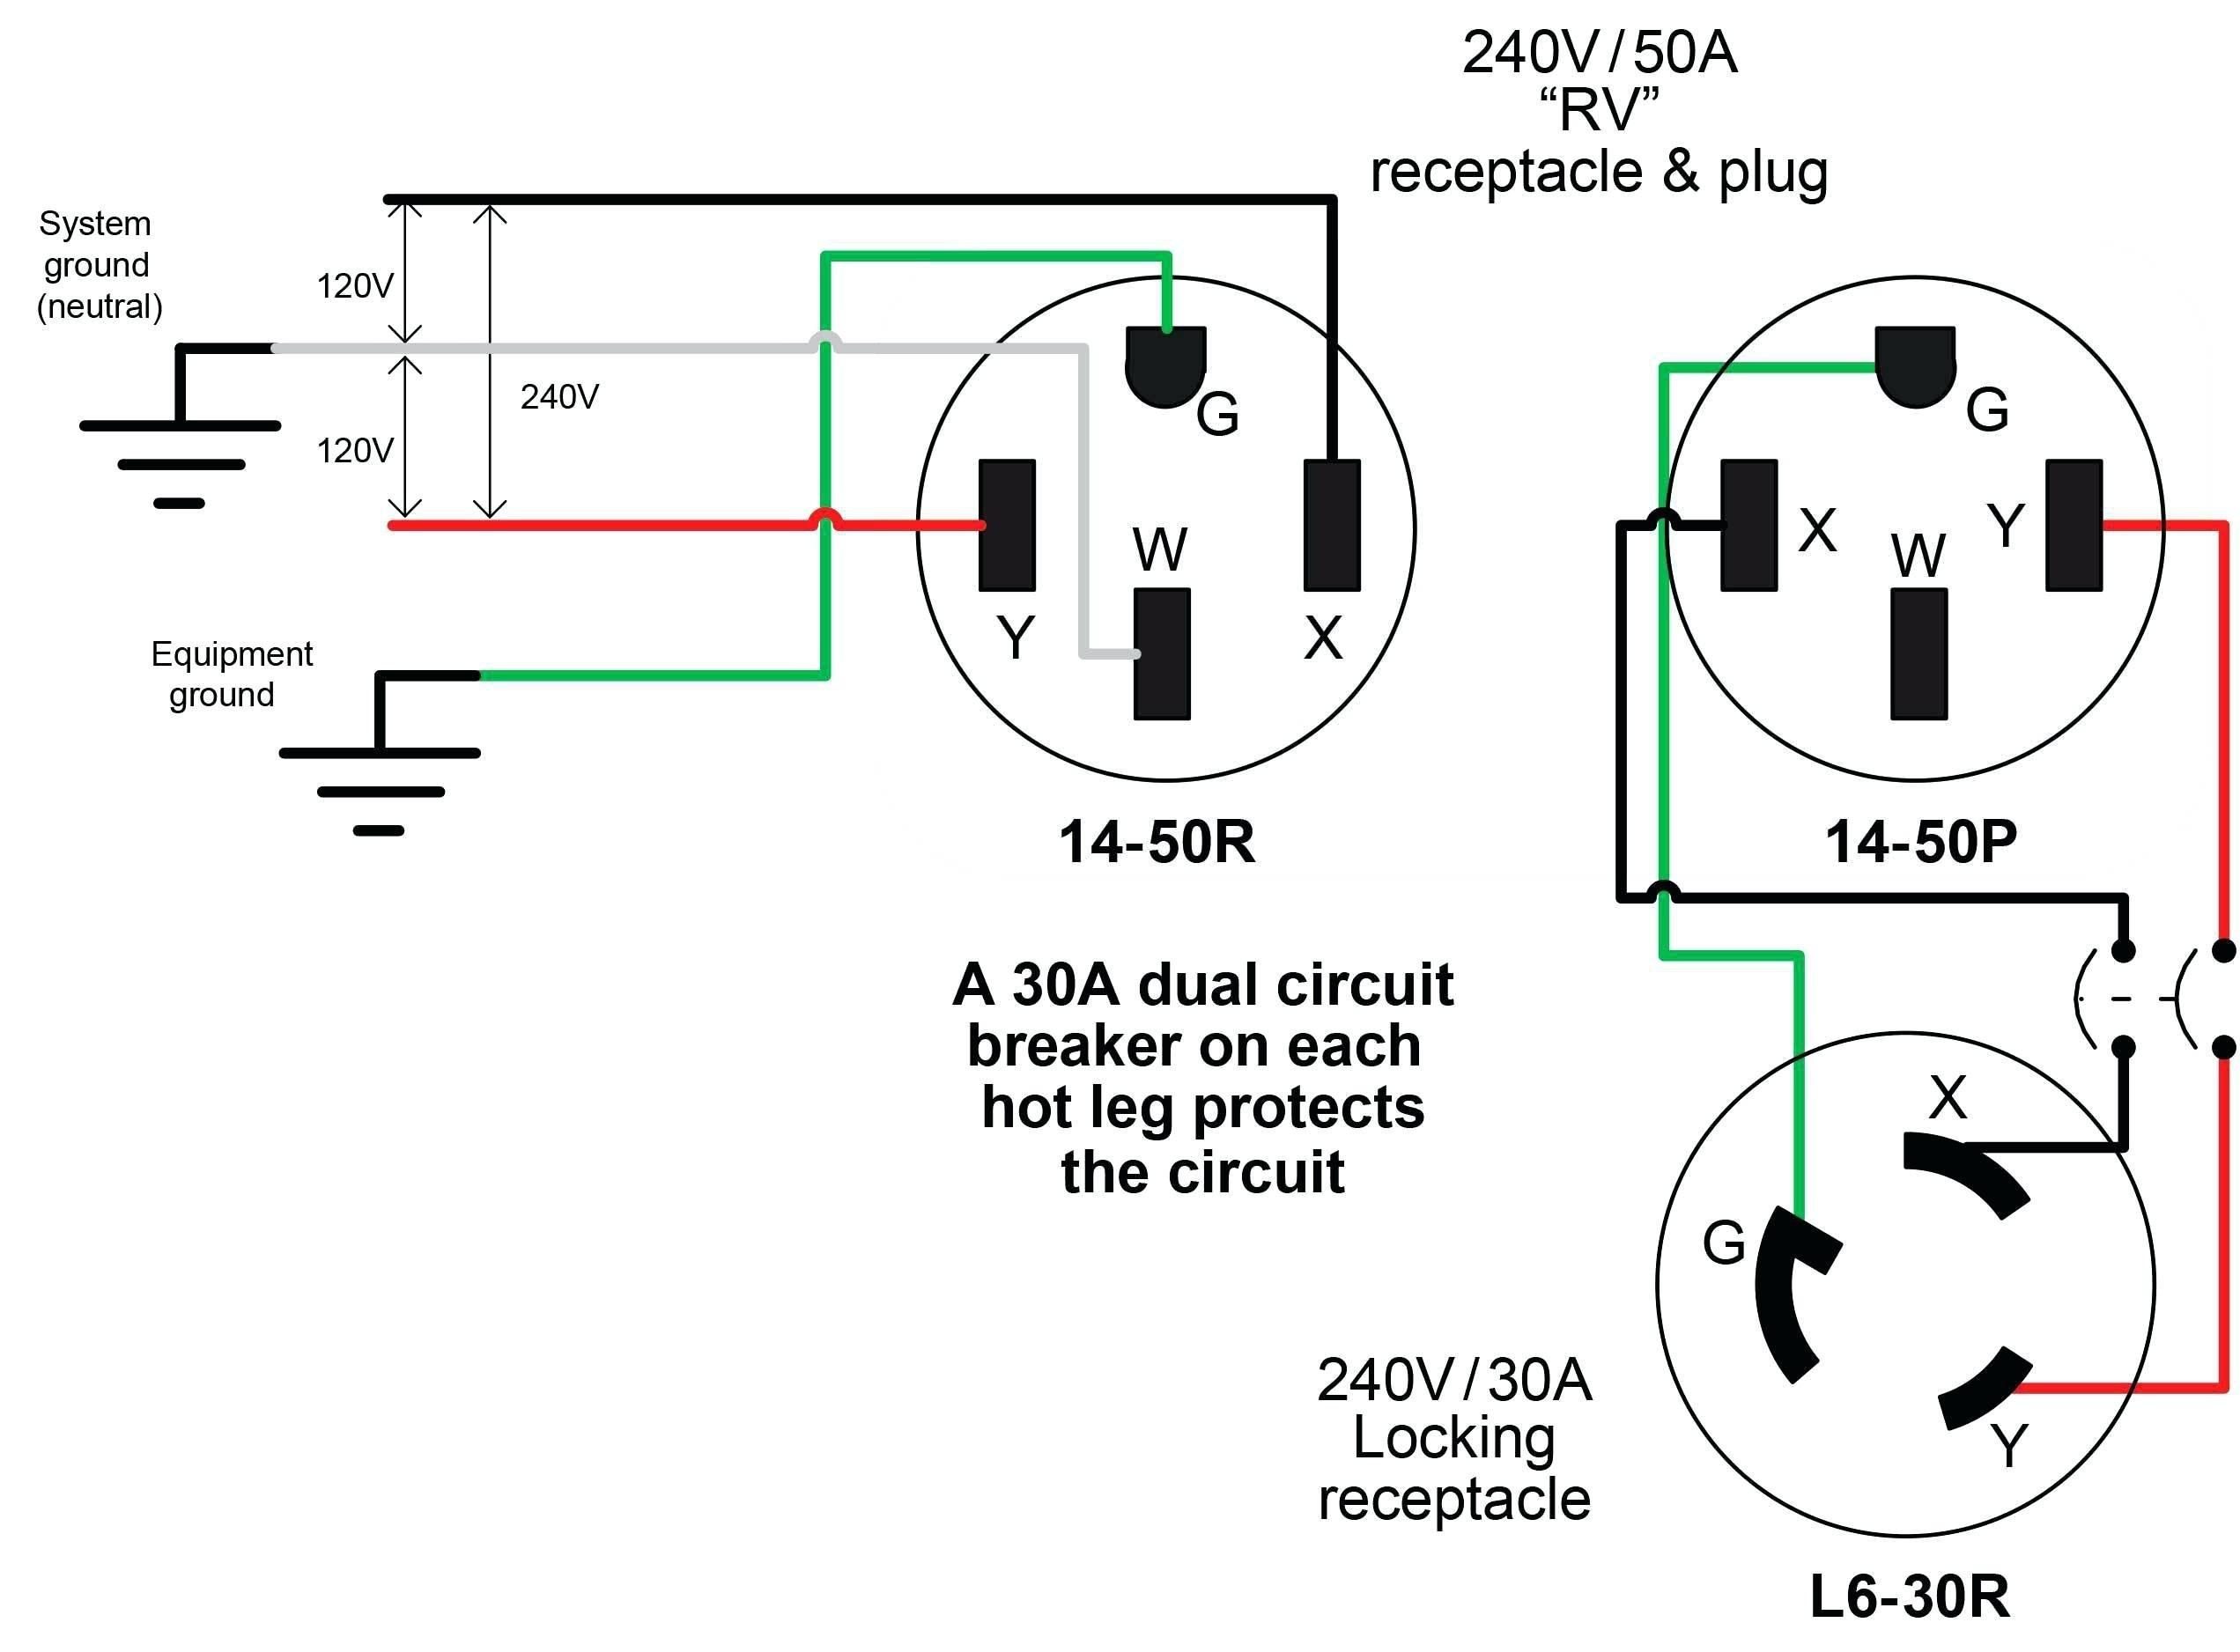 l14 30r wiring diagram Collection Nema L14 30 Wiring Diagram Best 110v Plug Wiring Diagram DOWNLOAD Wiring Diagram Sheets Detail Name l14 30r